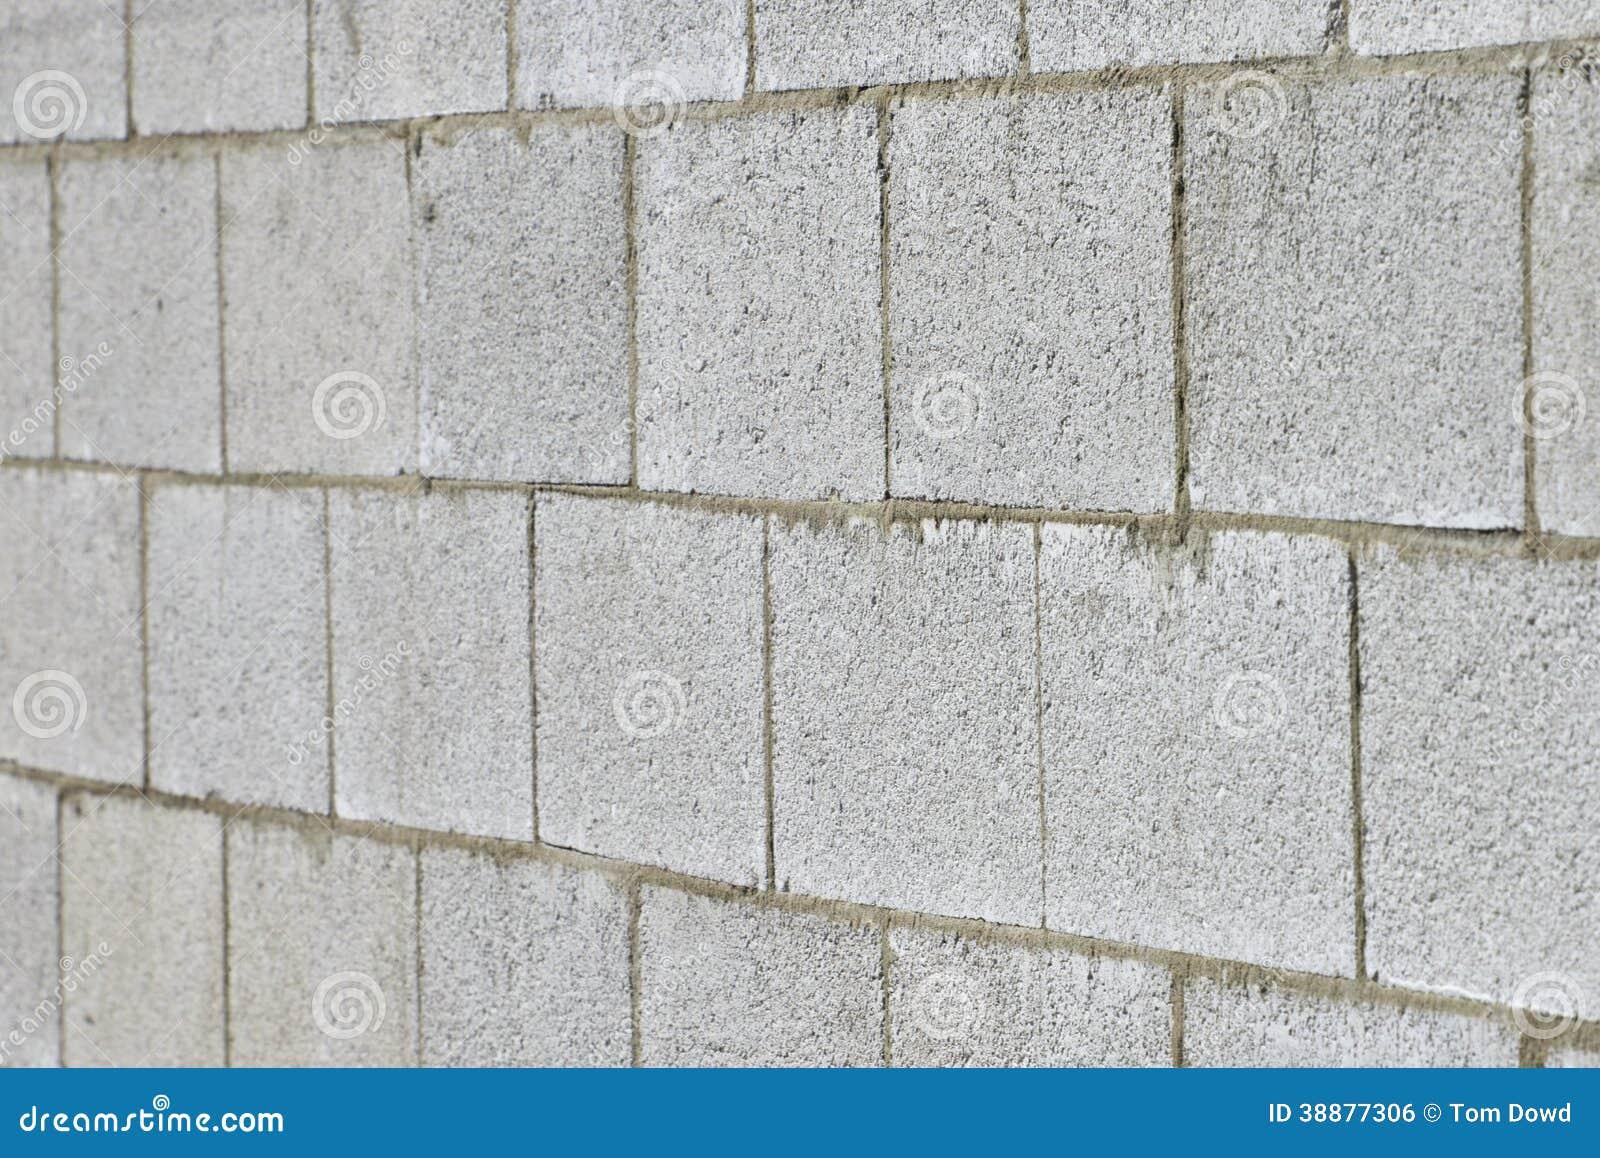 Concrete block wall stock photo image 38877306 for Cbs concrete